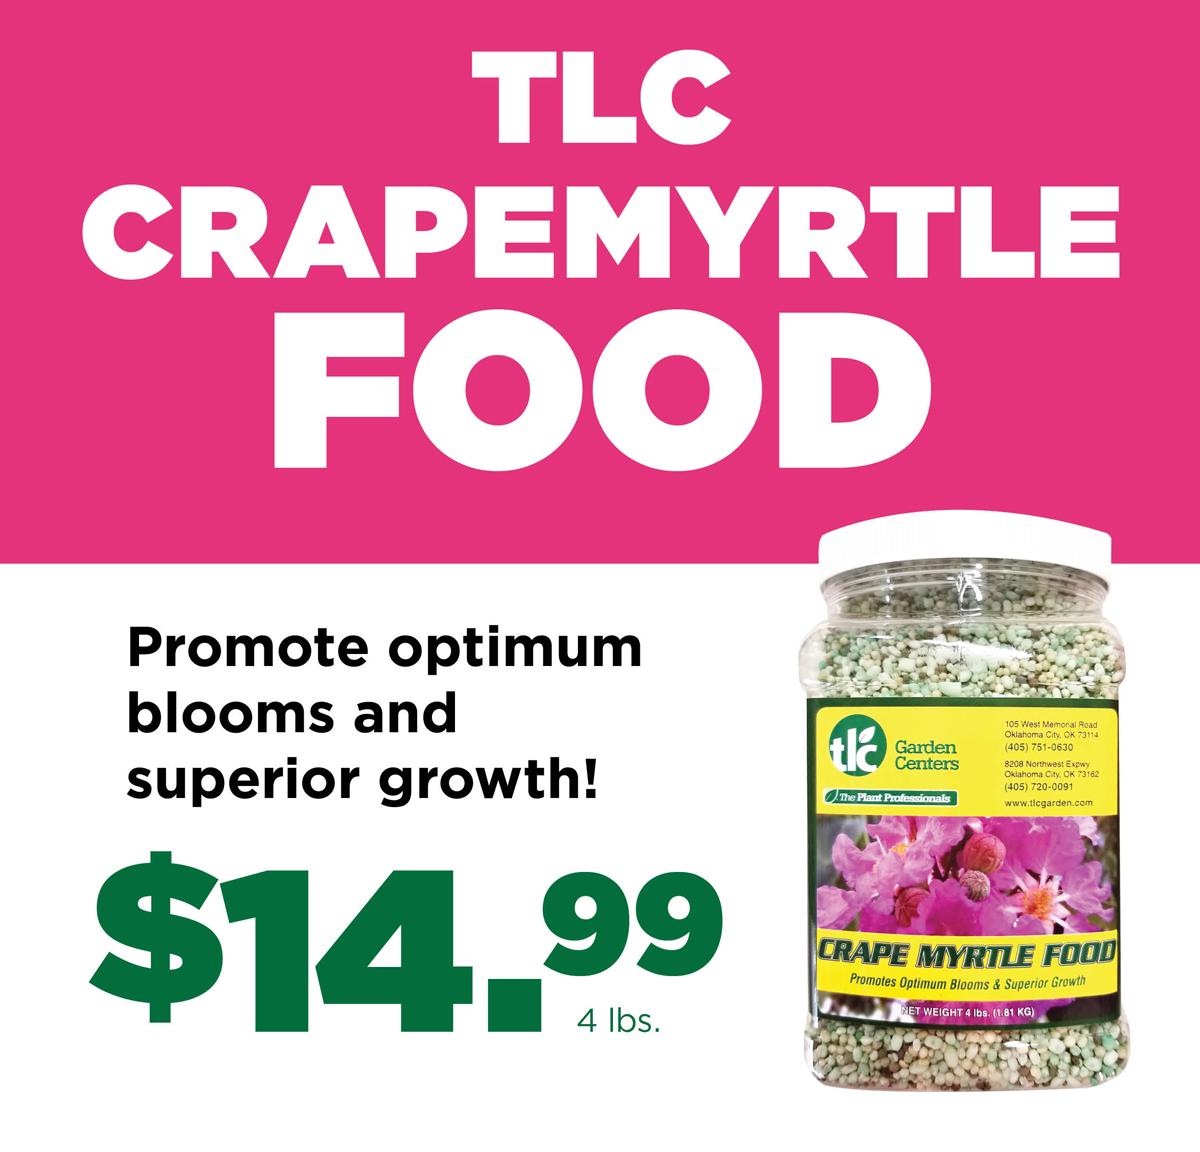 Crapemyrtle Food   TLC Garden Centers